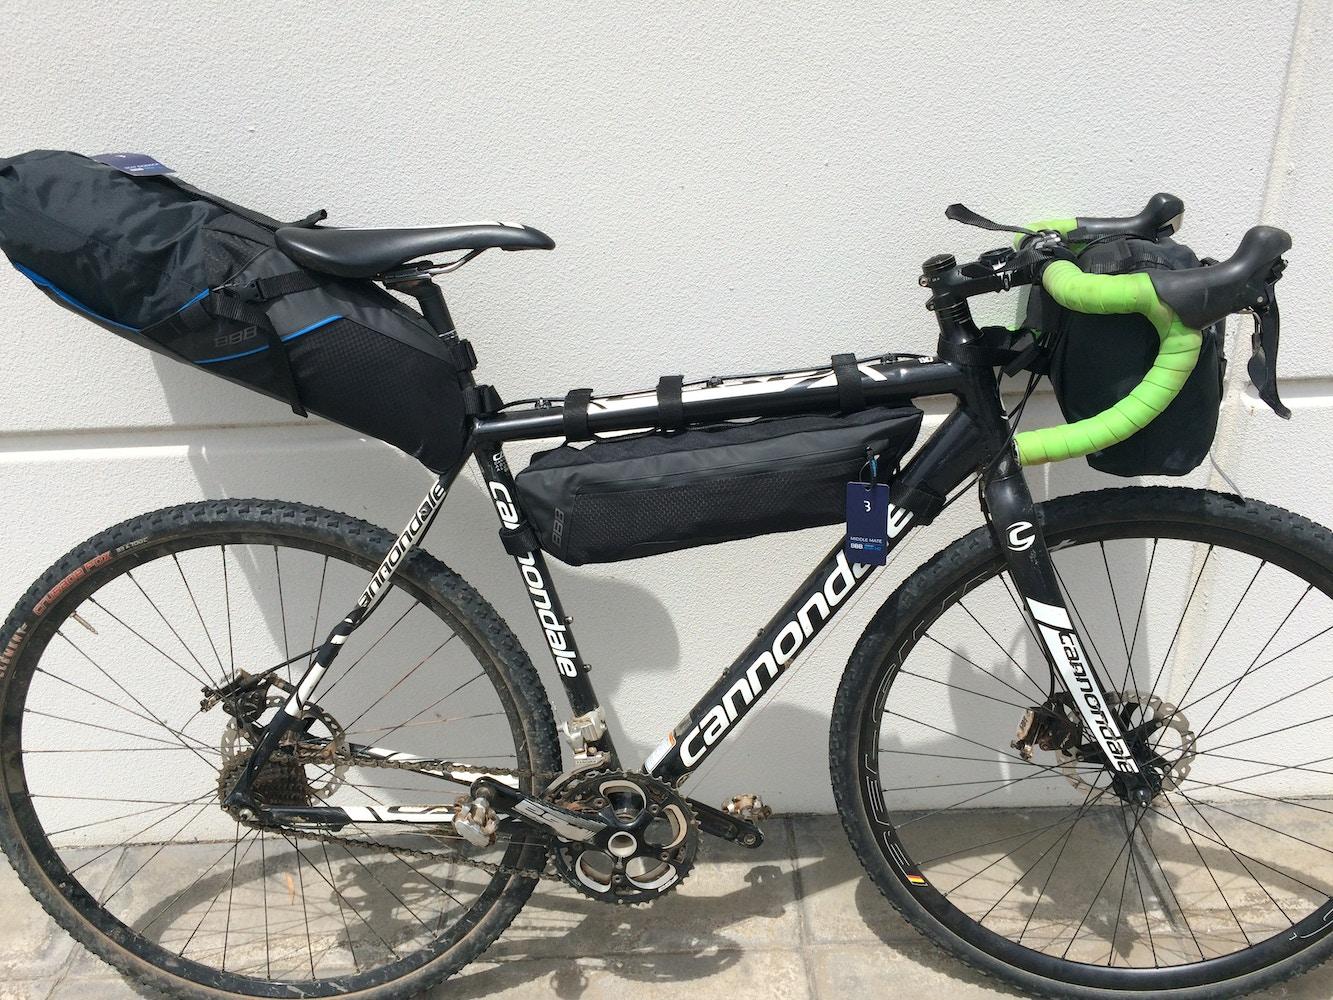 BBB Bikepacking Bags review